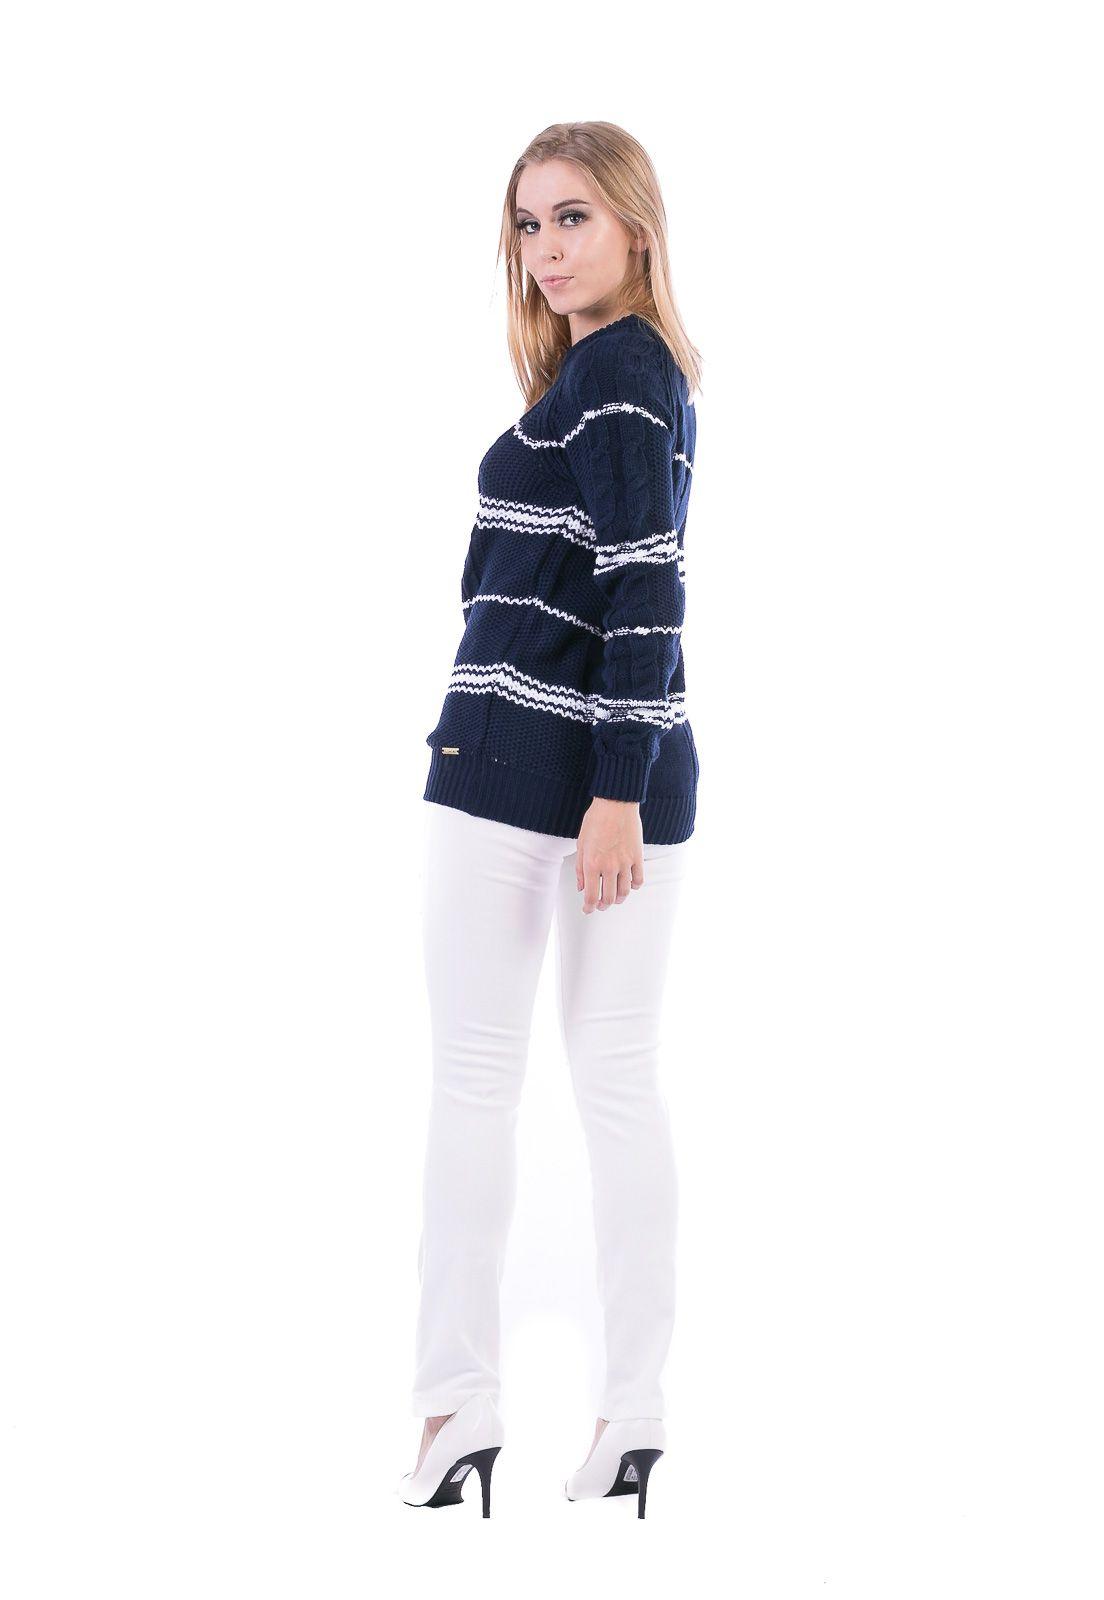 Blusa Dioxes Manga Longa de Tricot Listrada